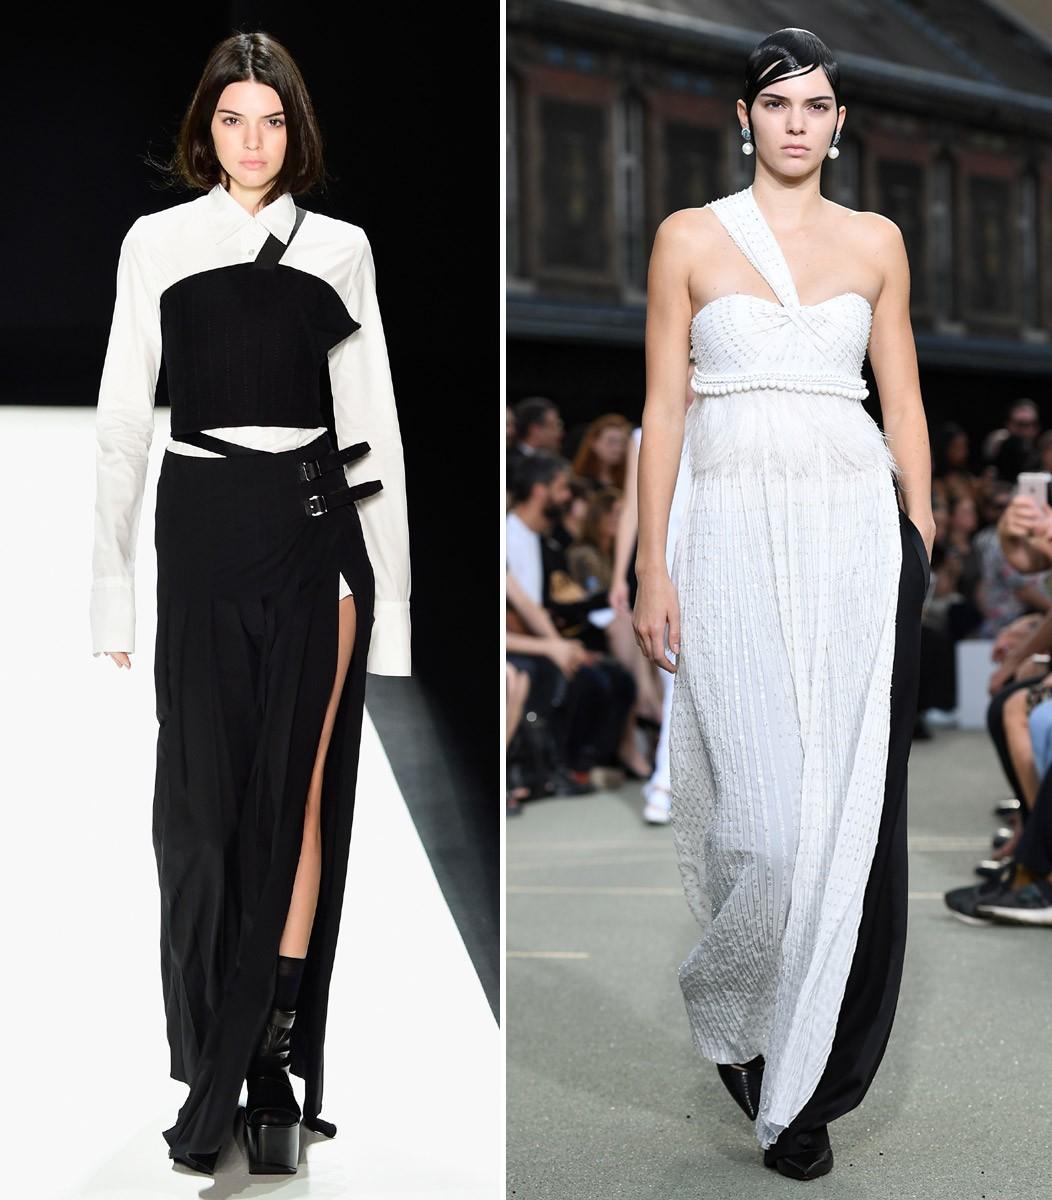 Entradas p&b na Vera Wang (inverno 2016) e Givenchy (alta costura inverno 2016) (Foto: Getty Images)